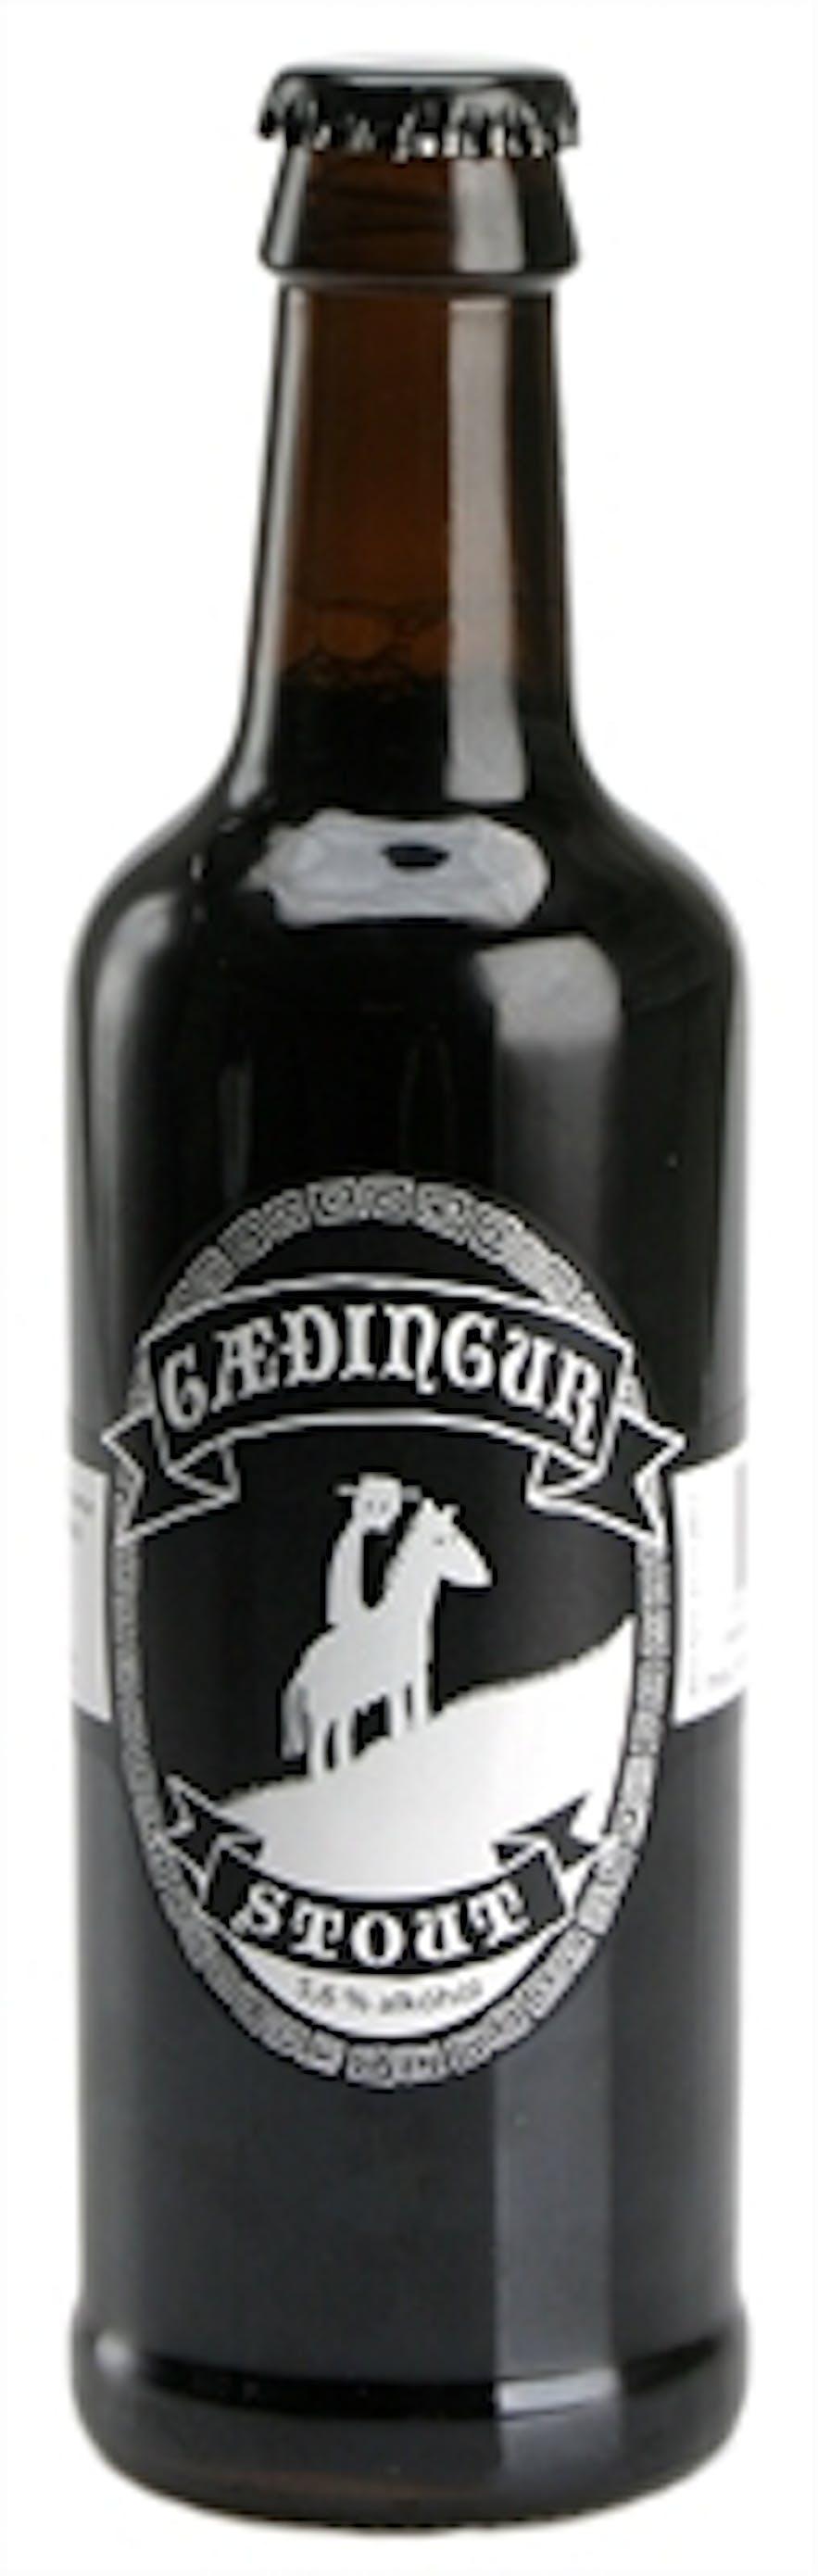 Gædingur Stout fights for the top spot